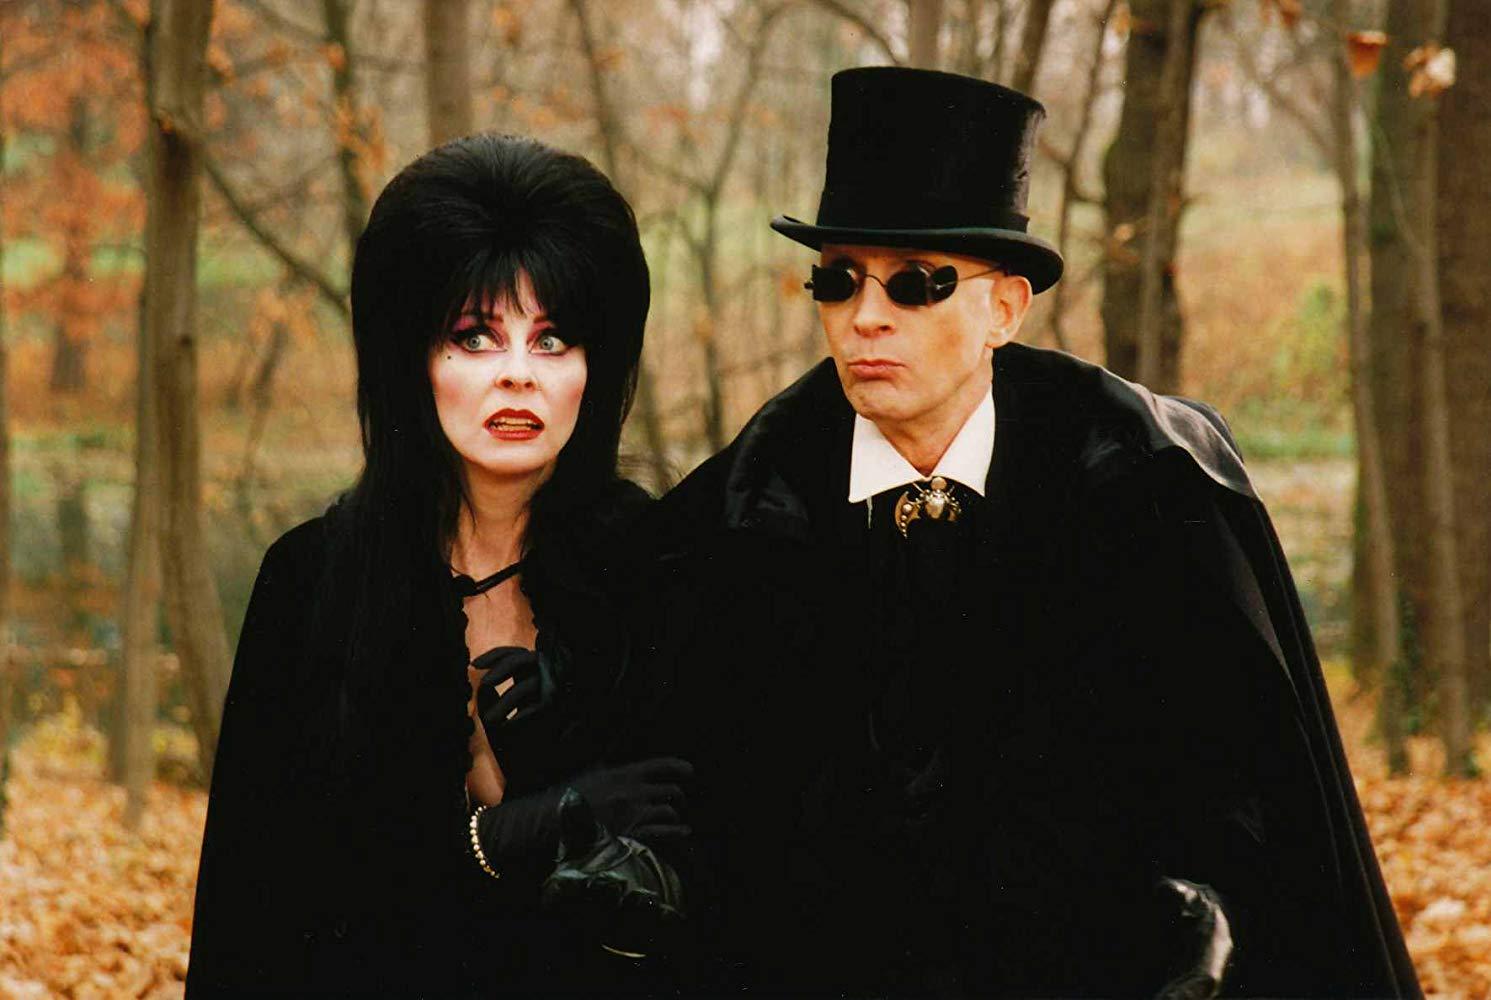 Elvira and Lord Vladimere Hellsubus (Richard O'Brien) in Elvira's Haunted Hills (2001)